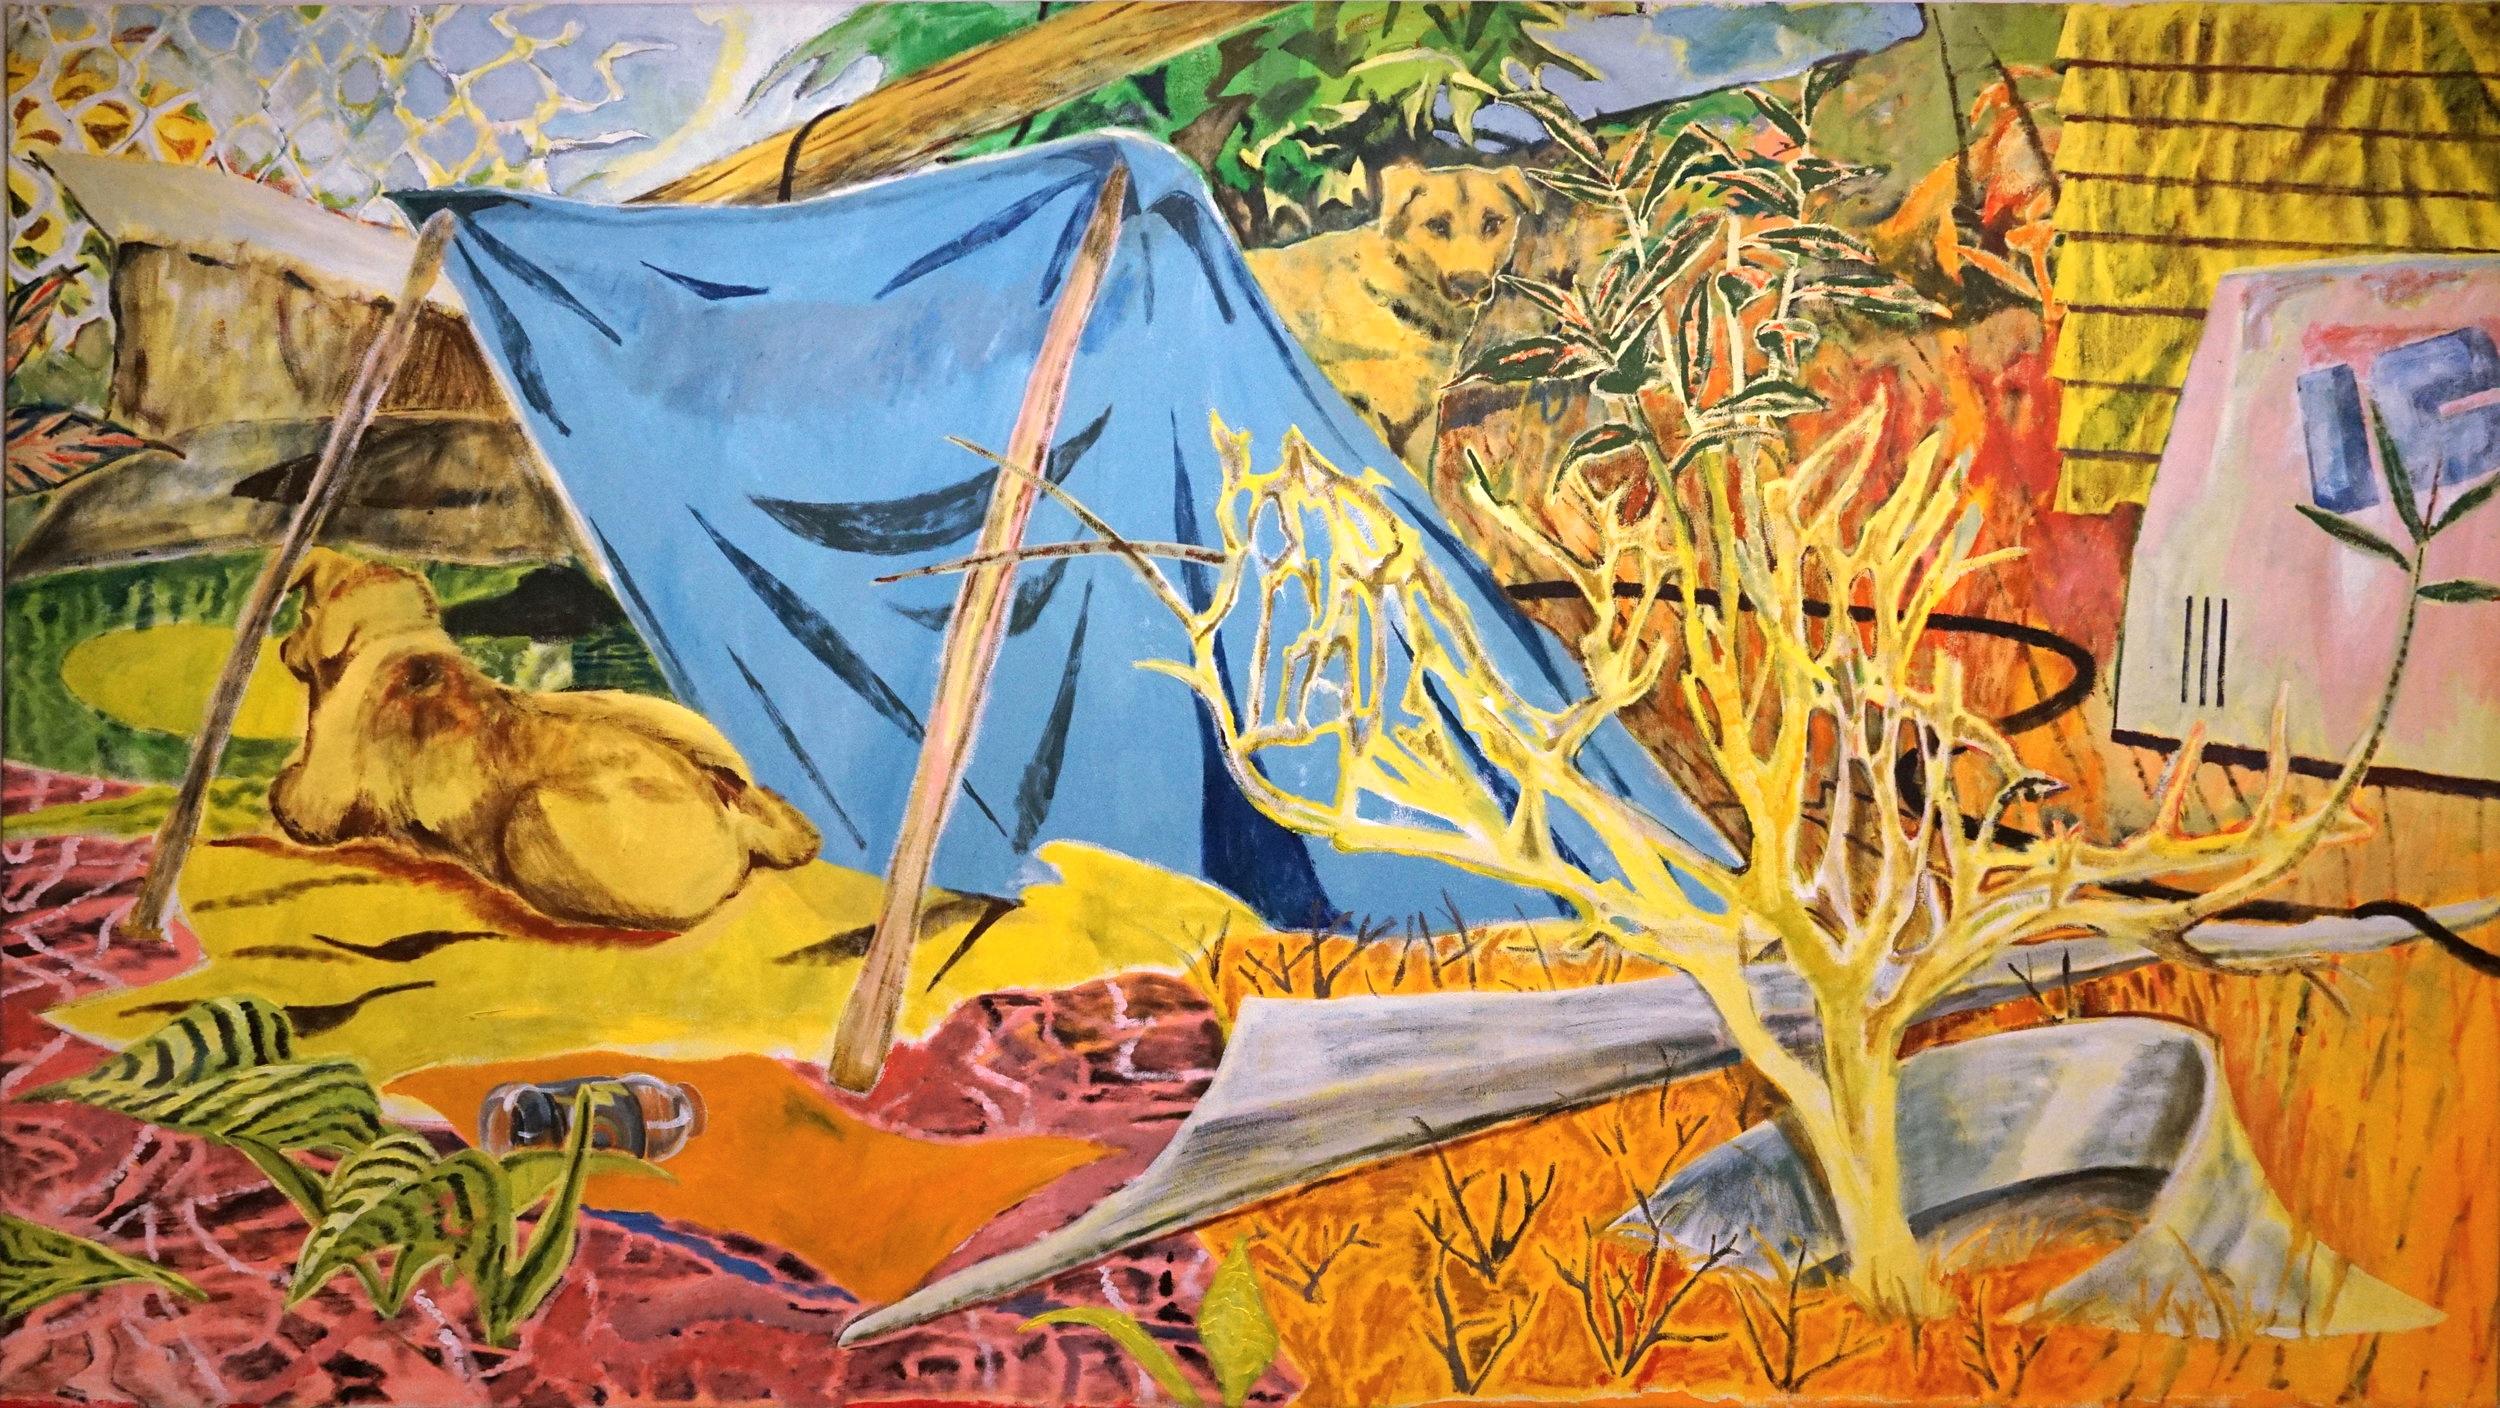 Hurricane Season, oil on canvas, 315x170cm, 2019